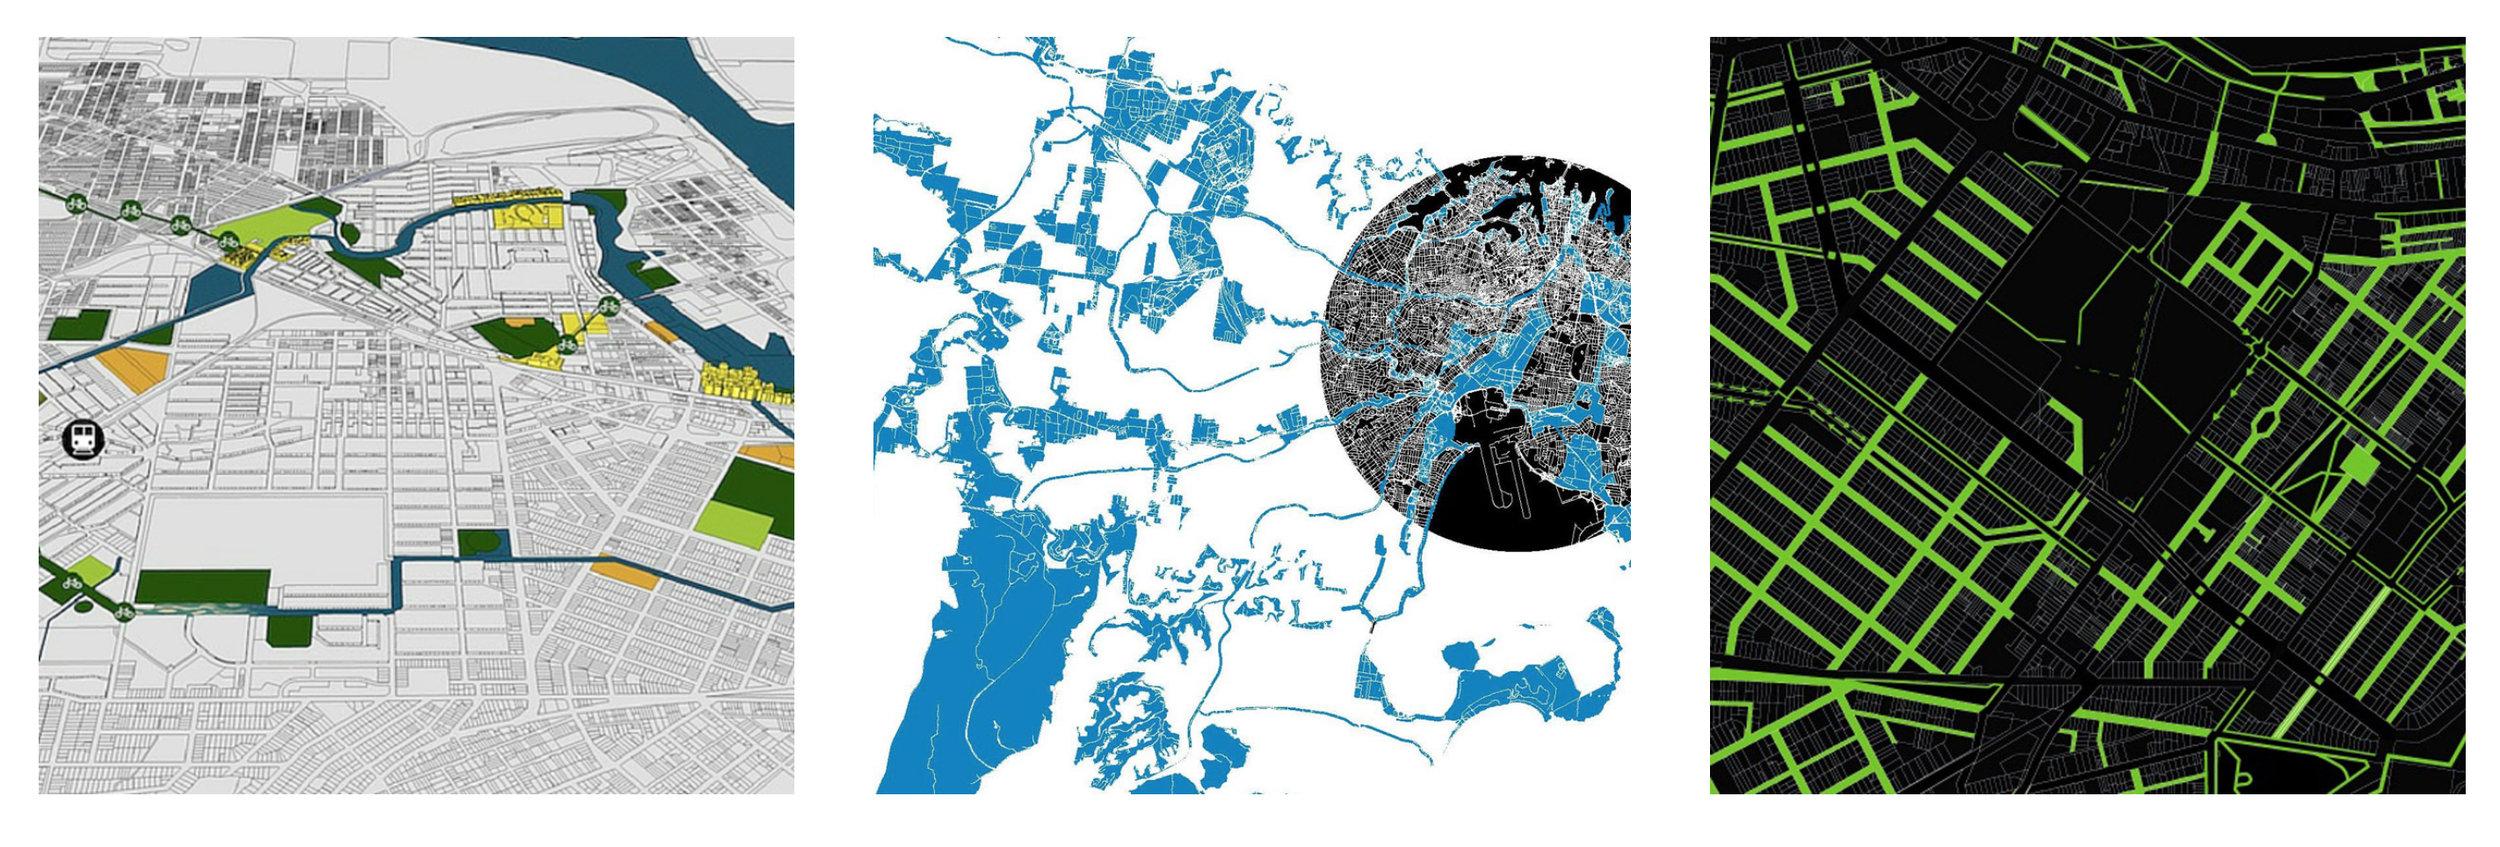 1_Ciclo-sapace Maps.jpg